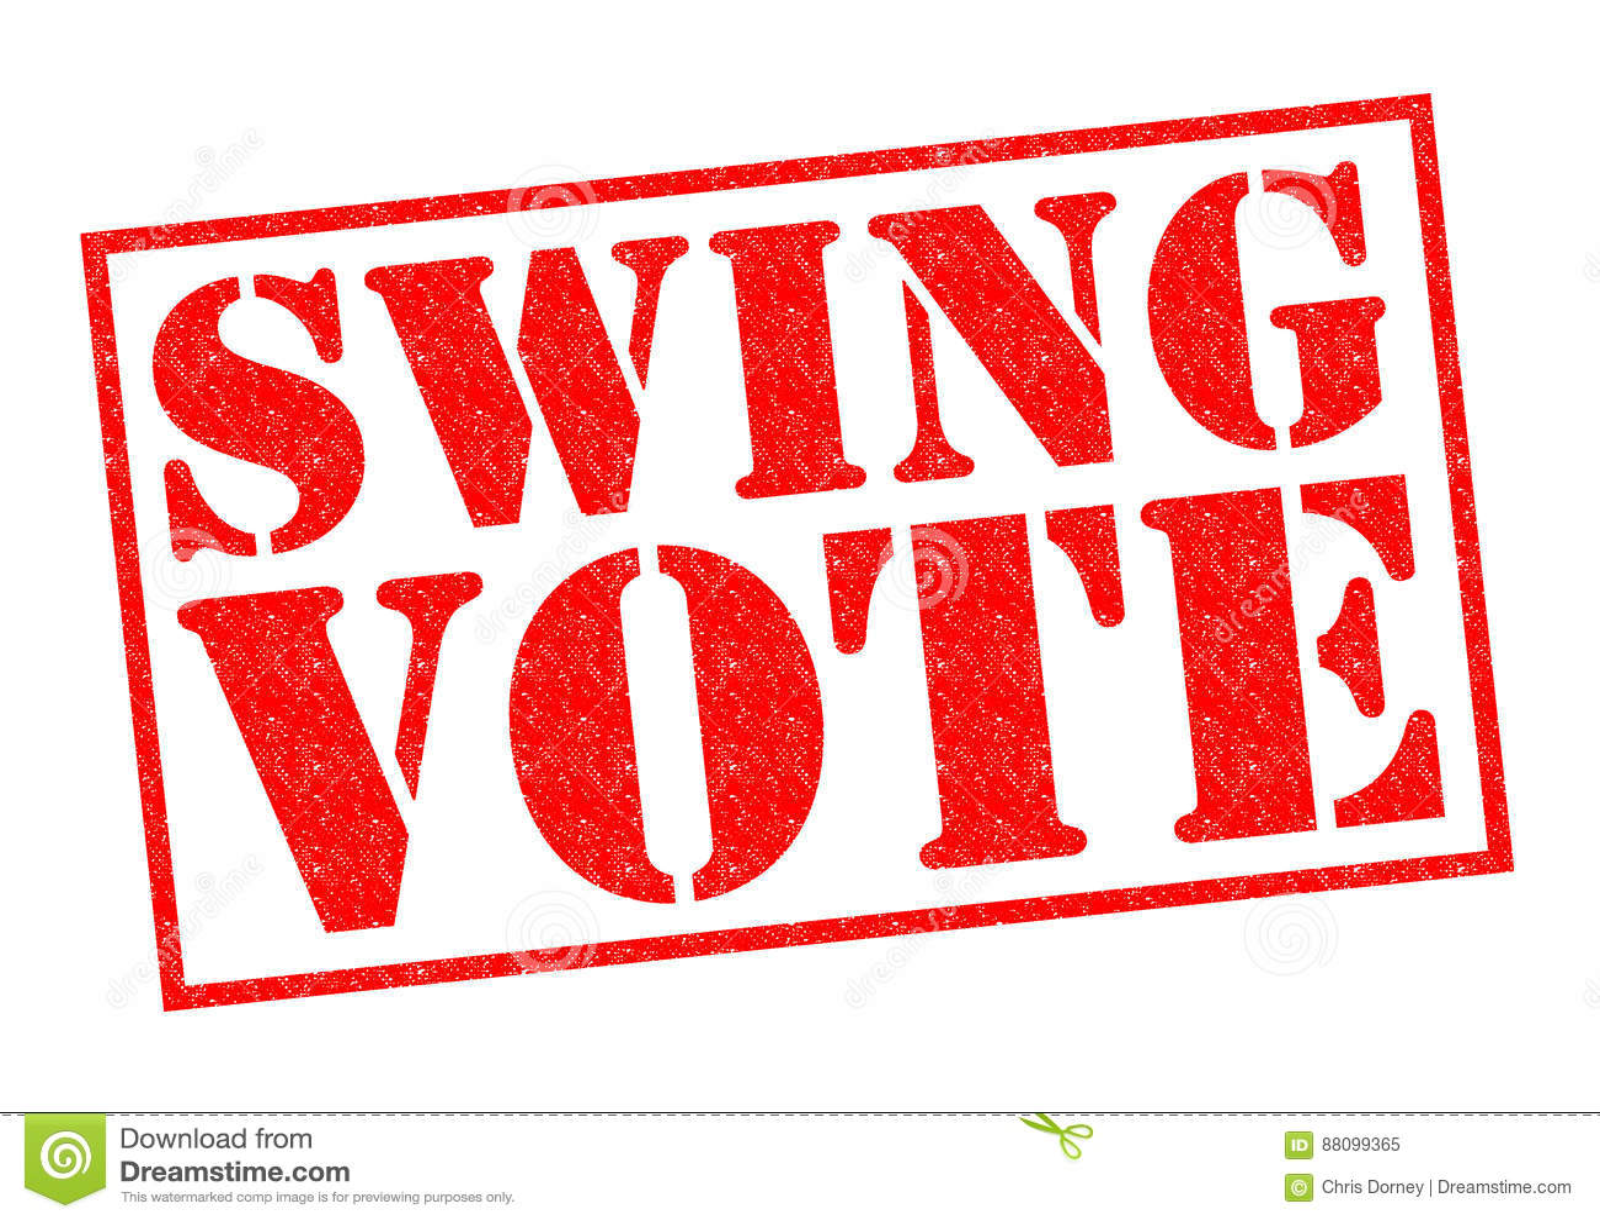 ☀ downloading movie trailer swing vote by jason richman.